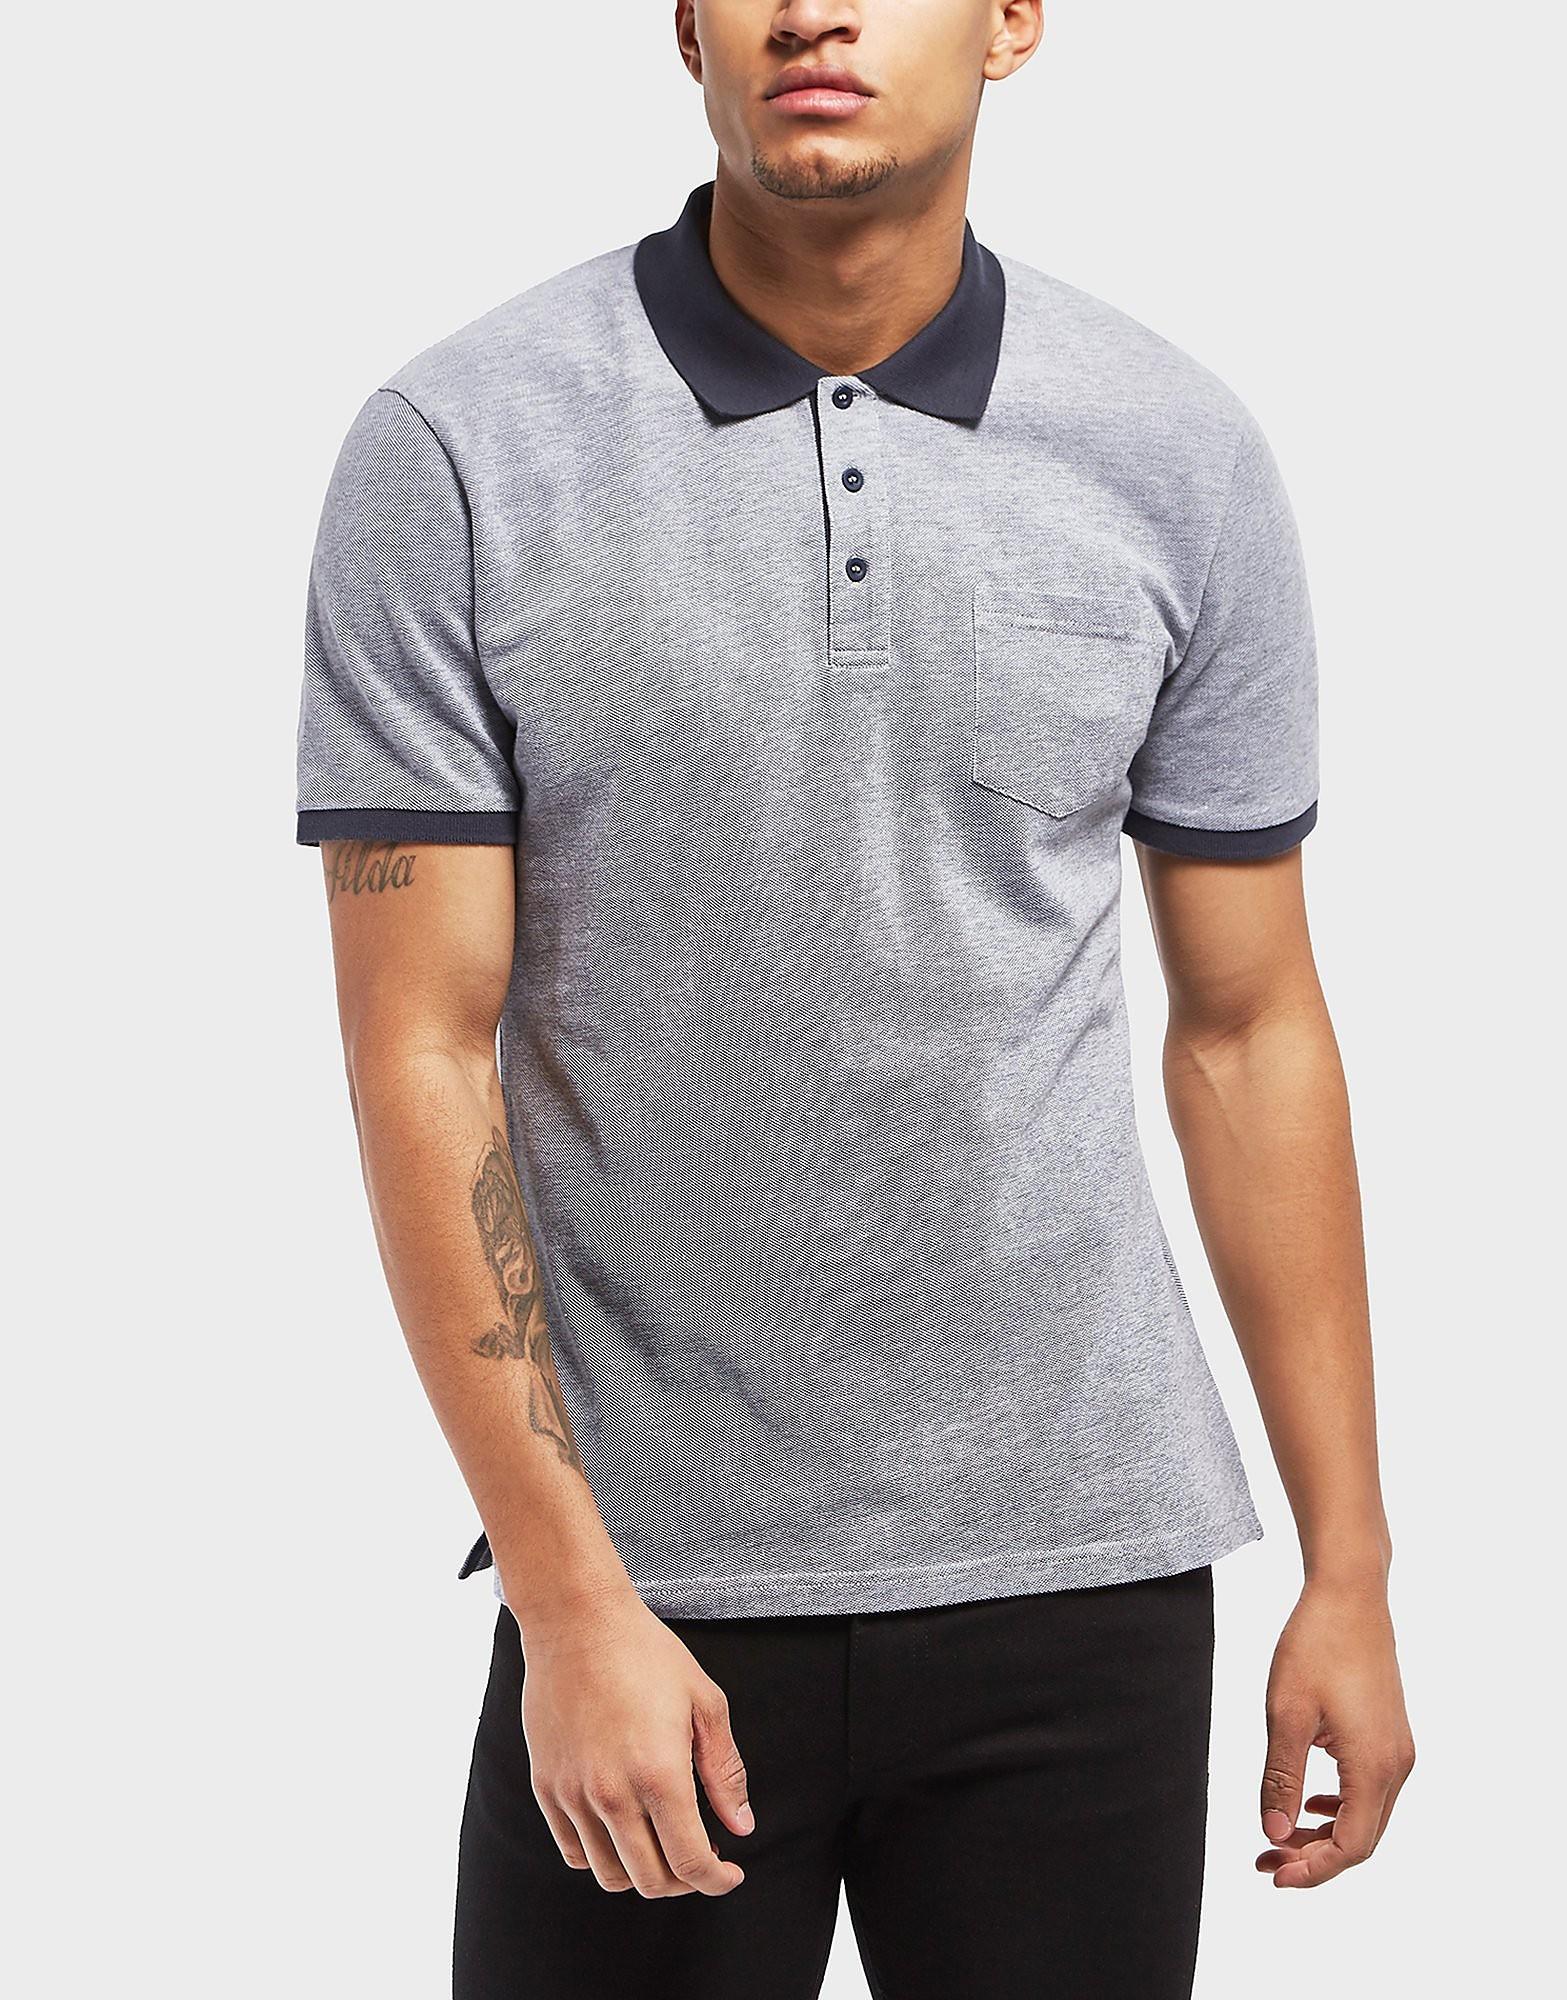 Pyrenex Joost Short Sleeve Polo Shirt